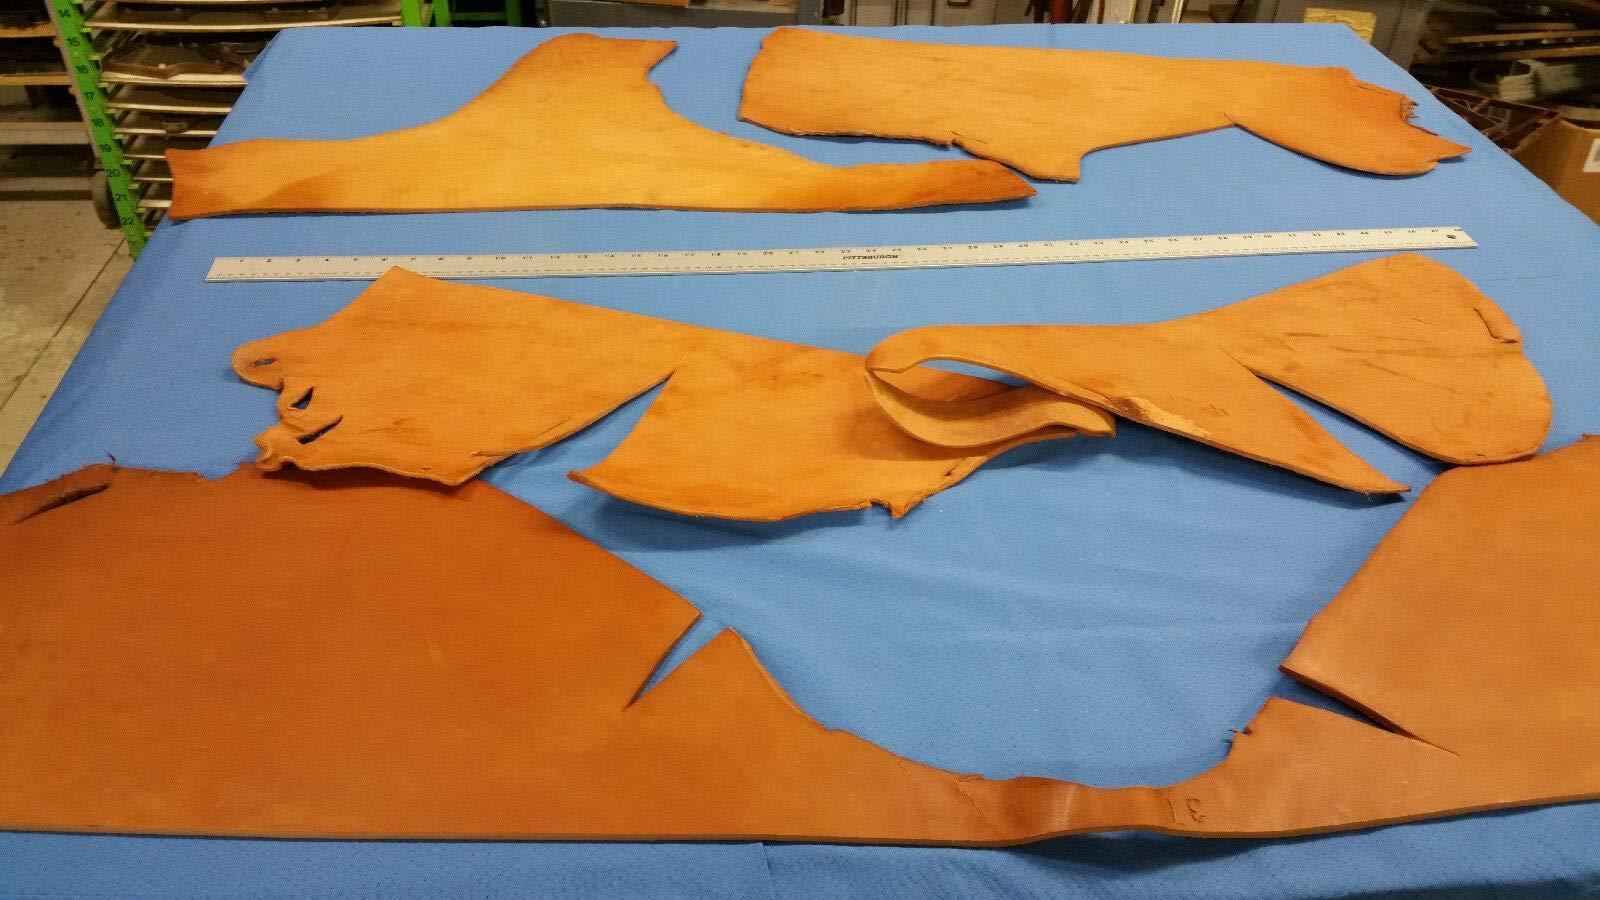 Veg-Tann/Harness/Bridle Full Grain Leather Natural, Bundle #13/10 oz +